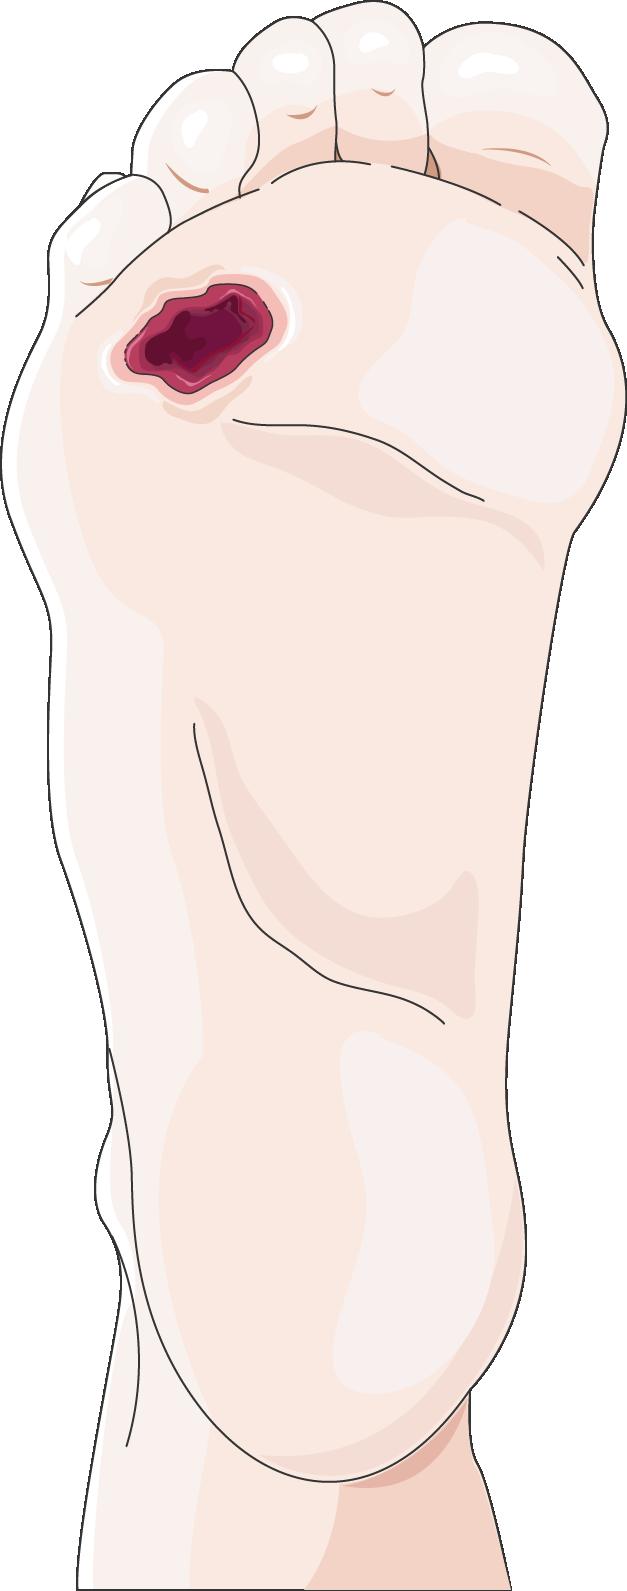 Foot clipart diabetic foot. Servier medical art free